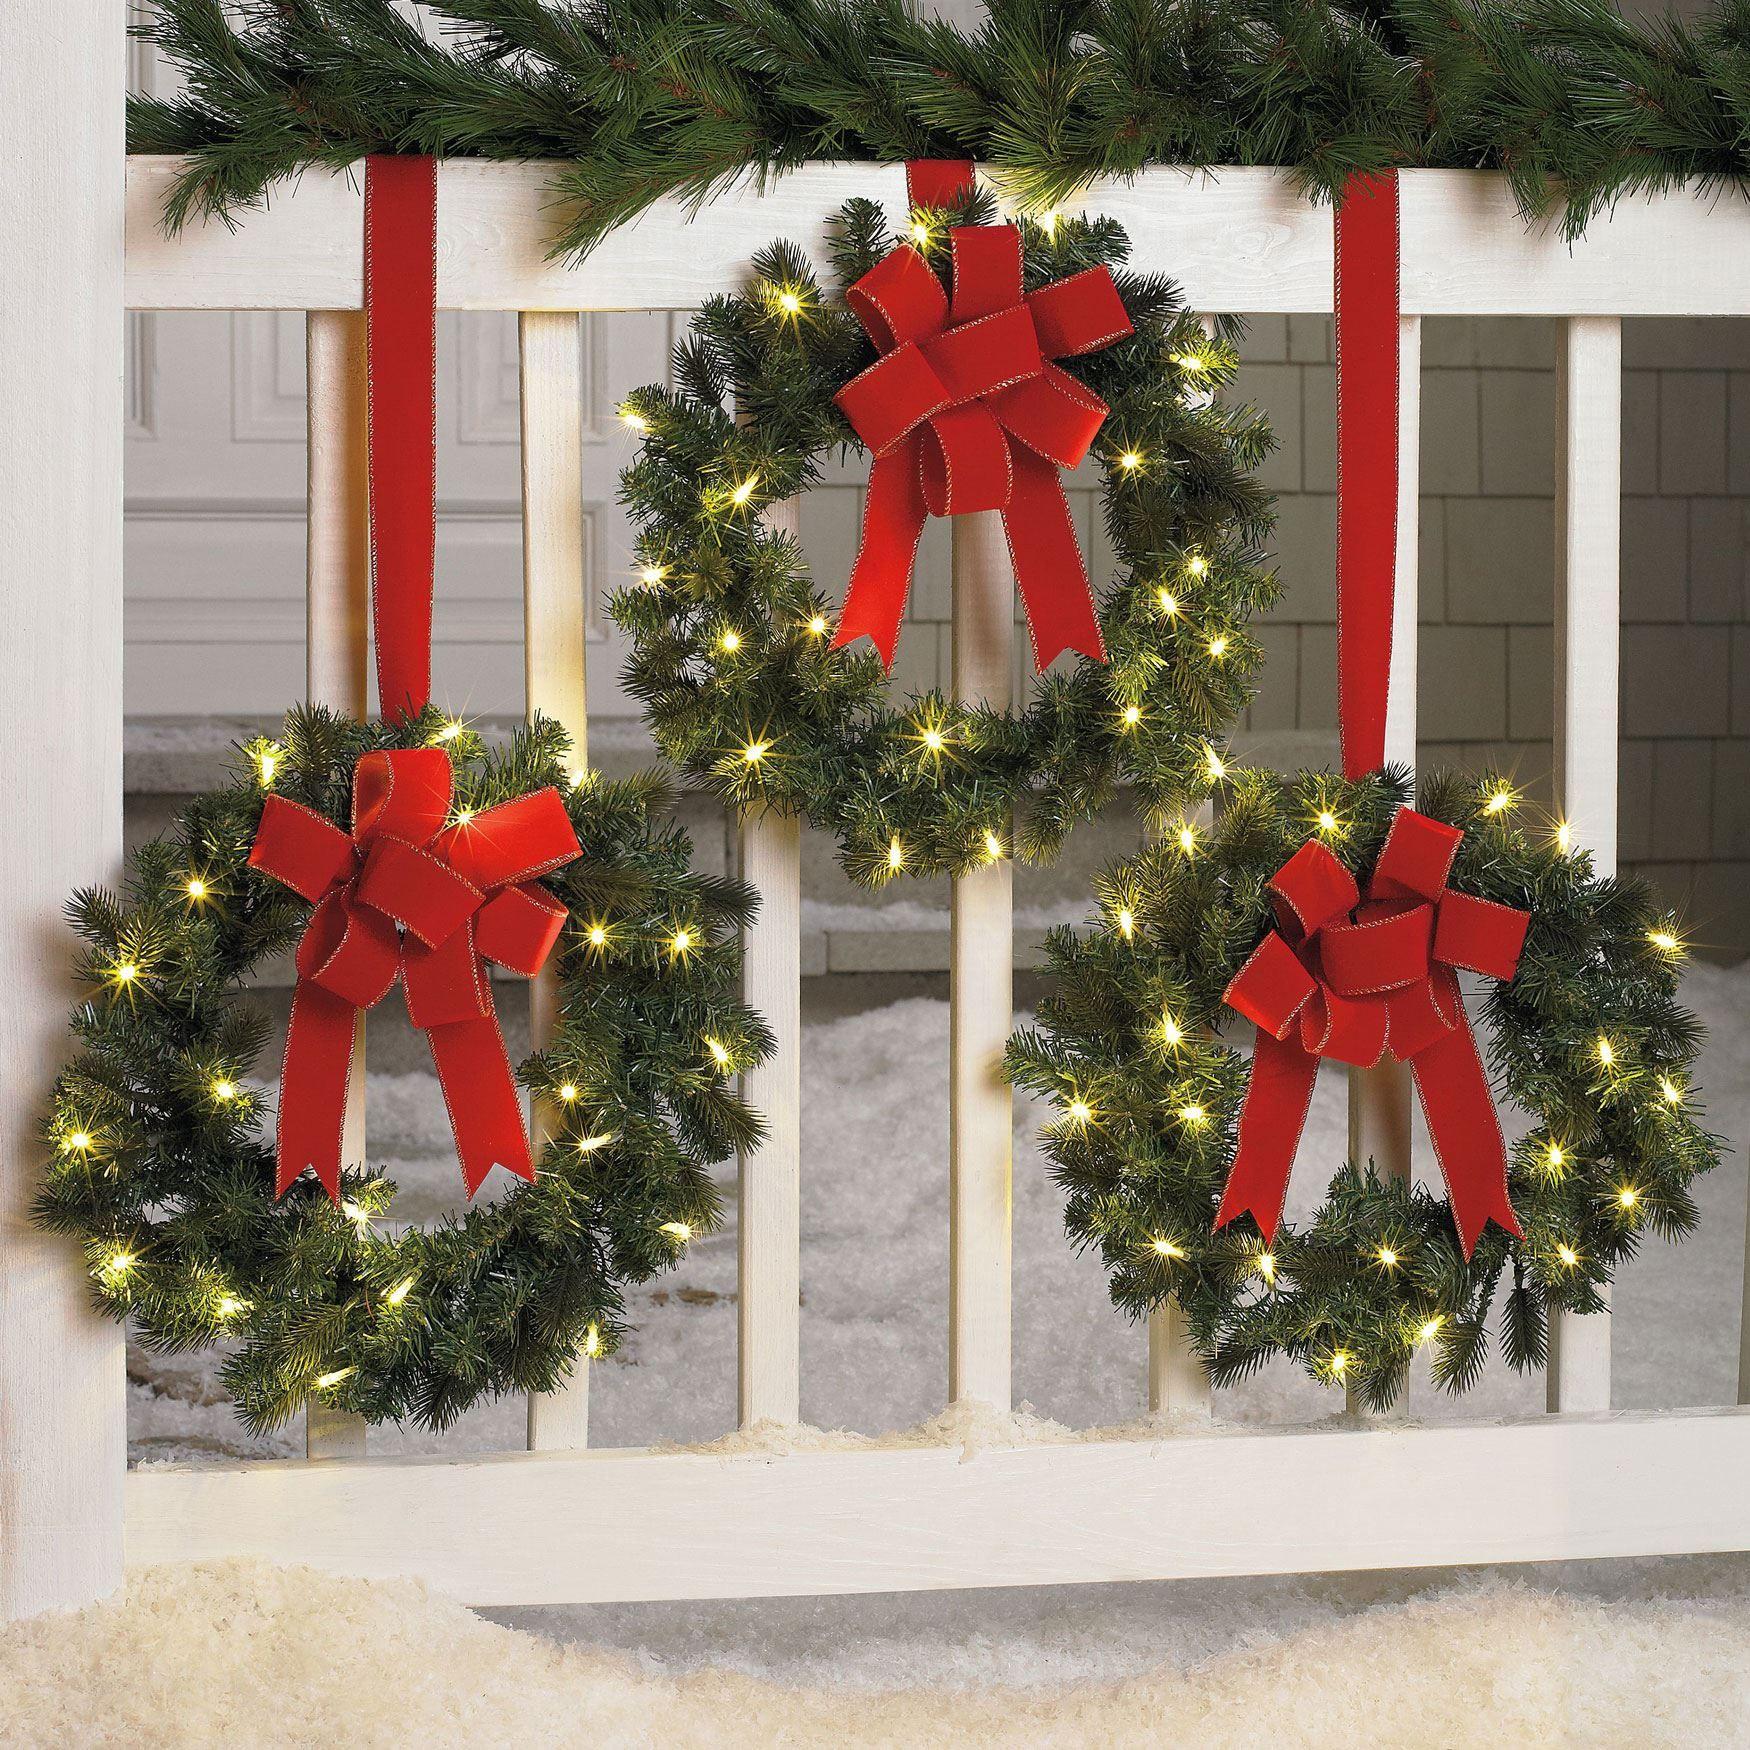 Set Of 3 Cordless Pre Lit Mini Christmas Wreaths Christmas Wreaths With Lights Christmas Wreaths Outdoor Christmas Diy